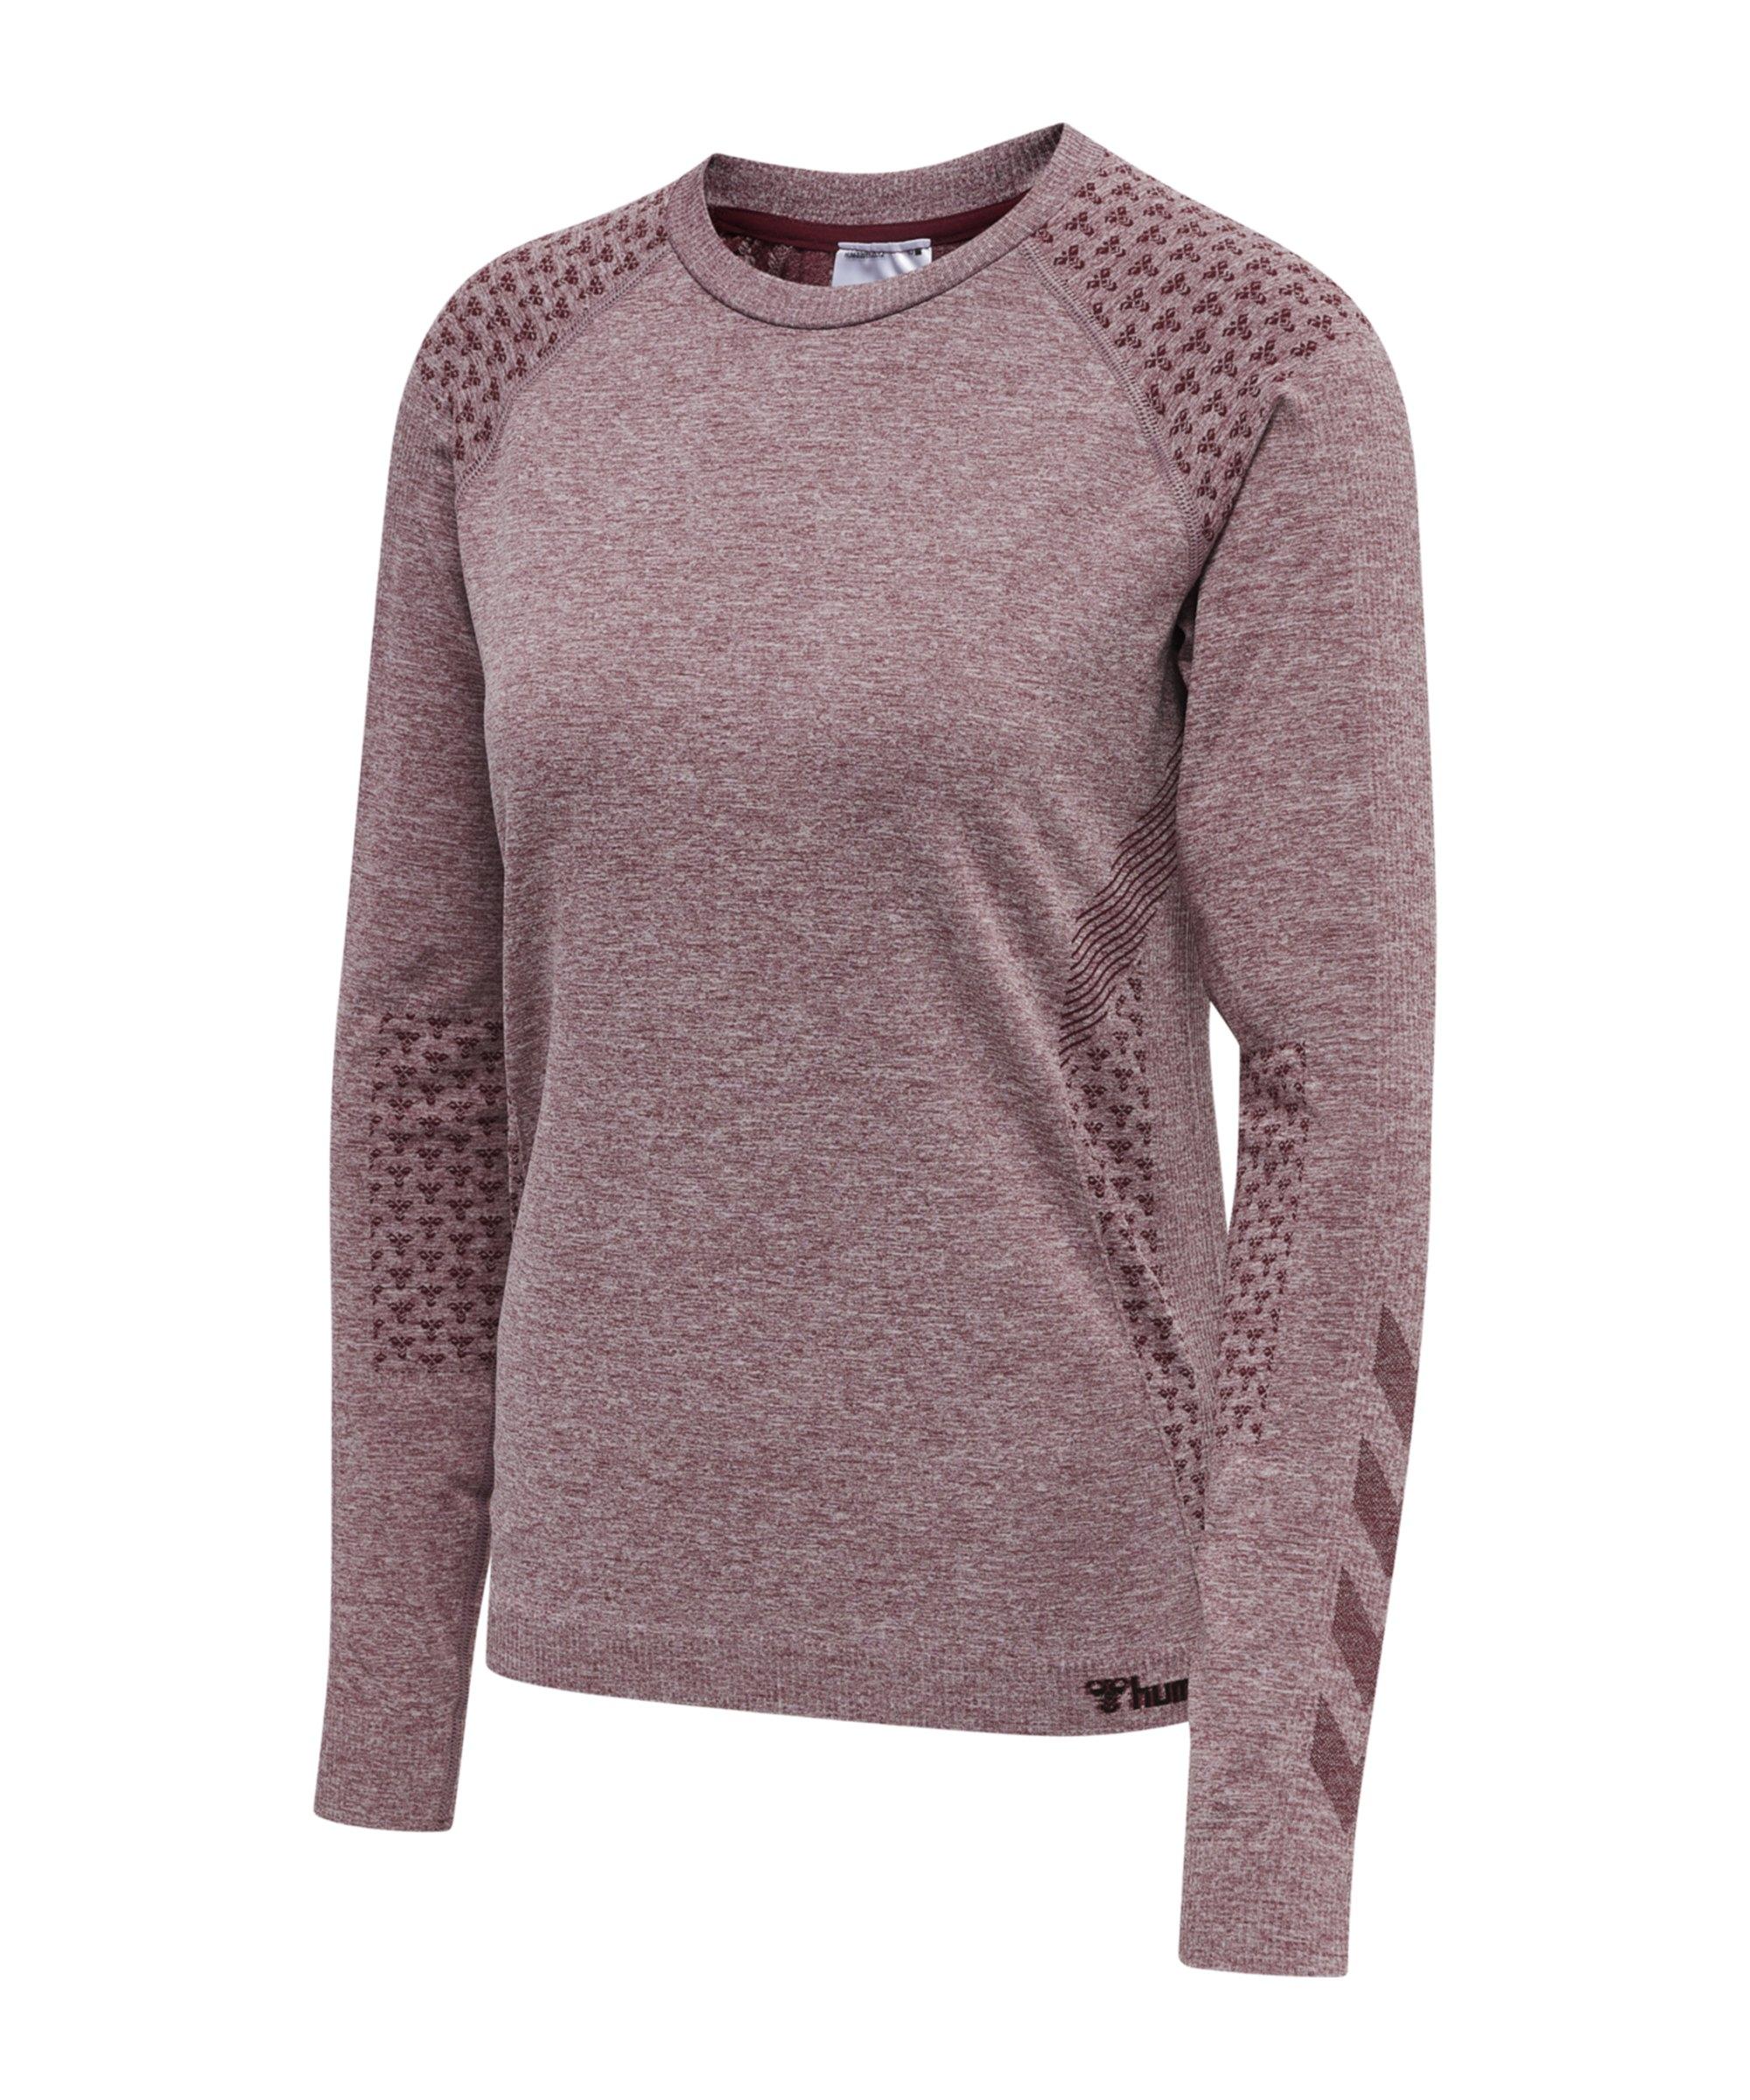 Hummel hmlci Seamless Sweatshirt Damen F4770 - rosa